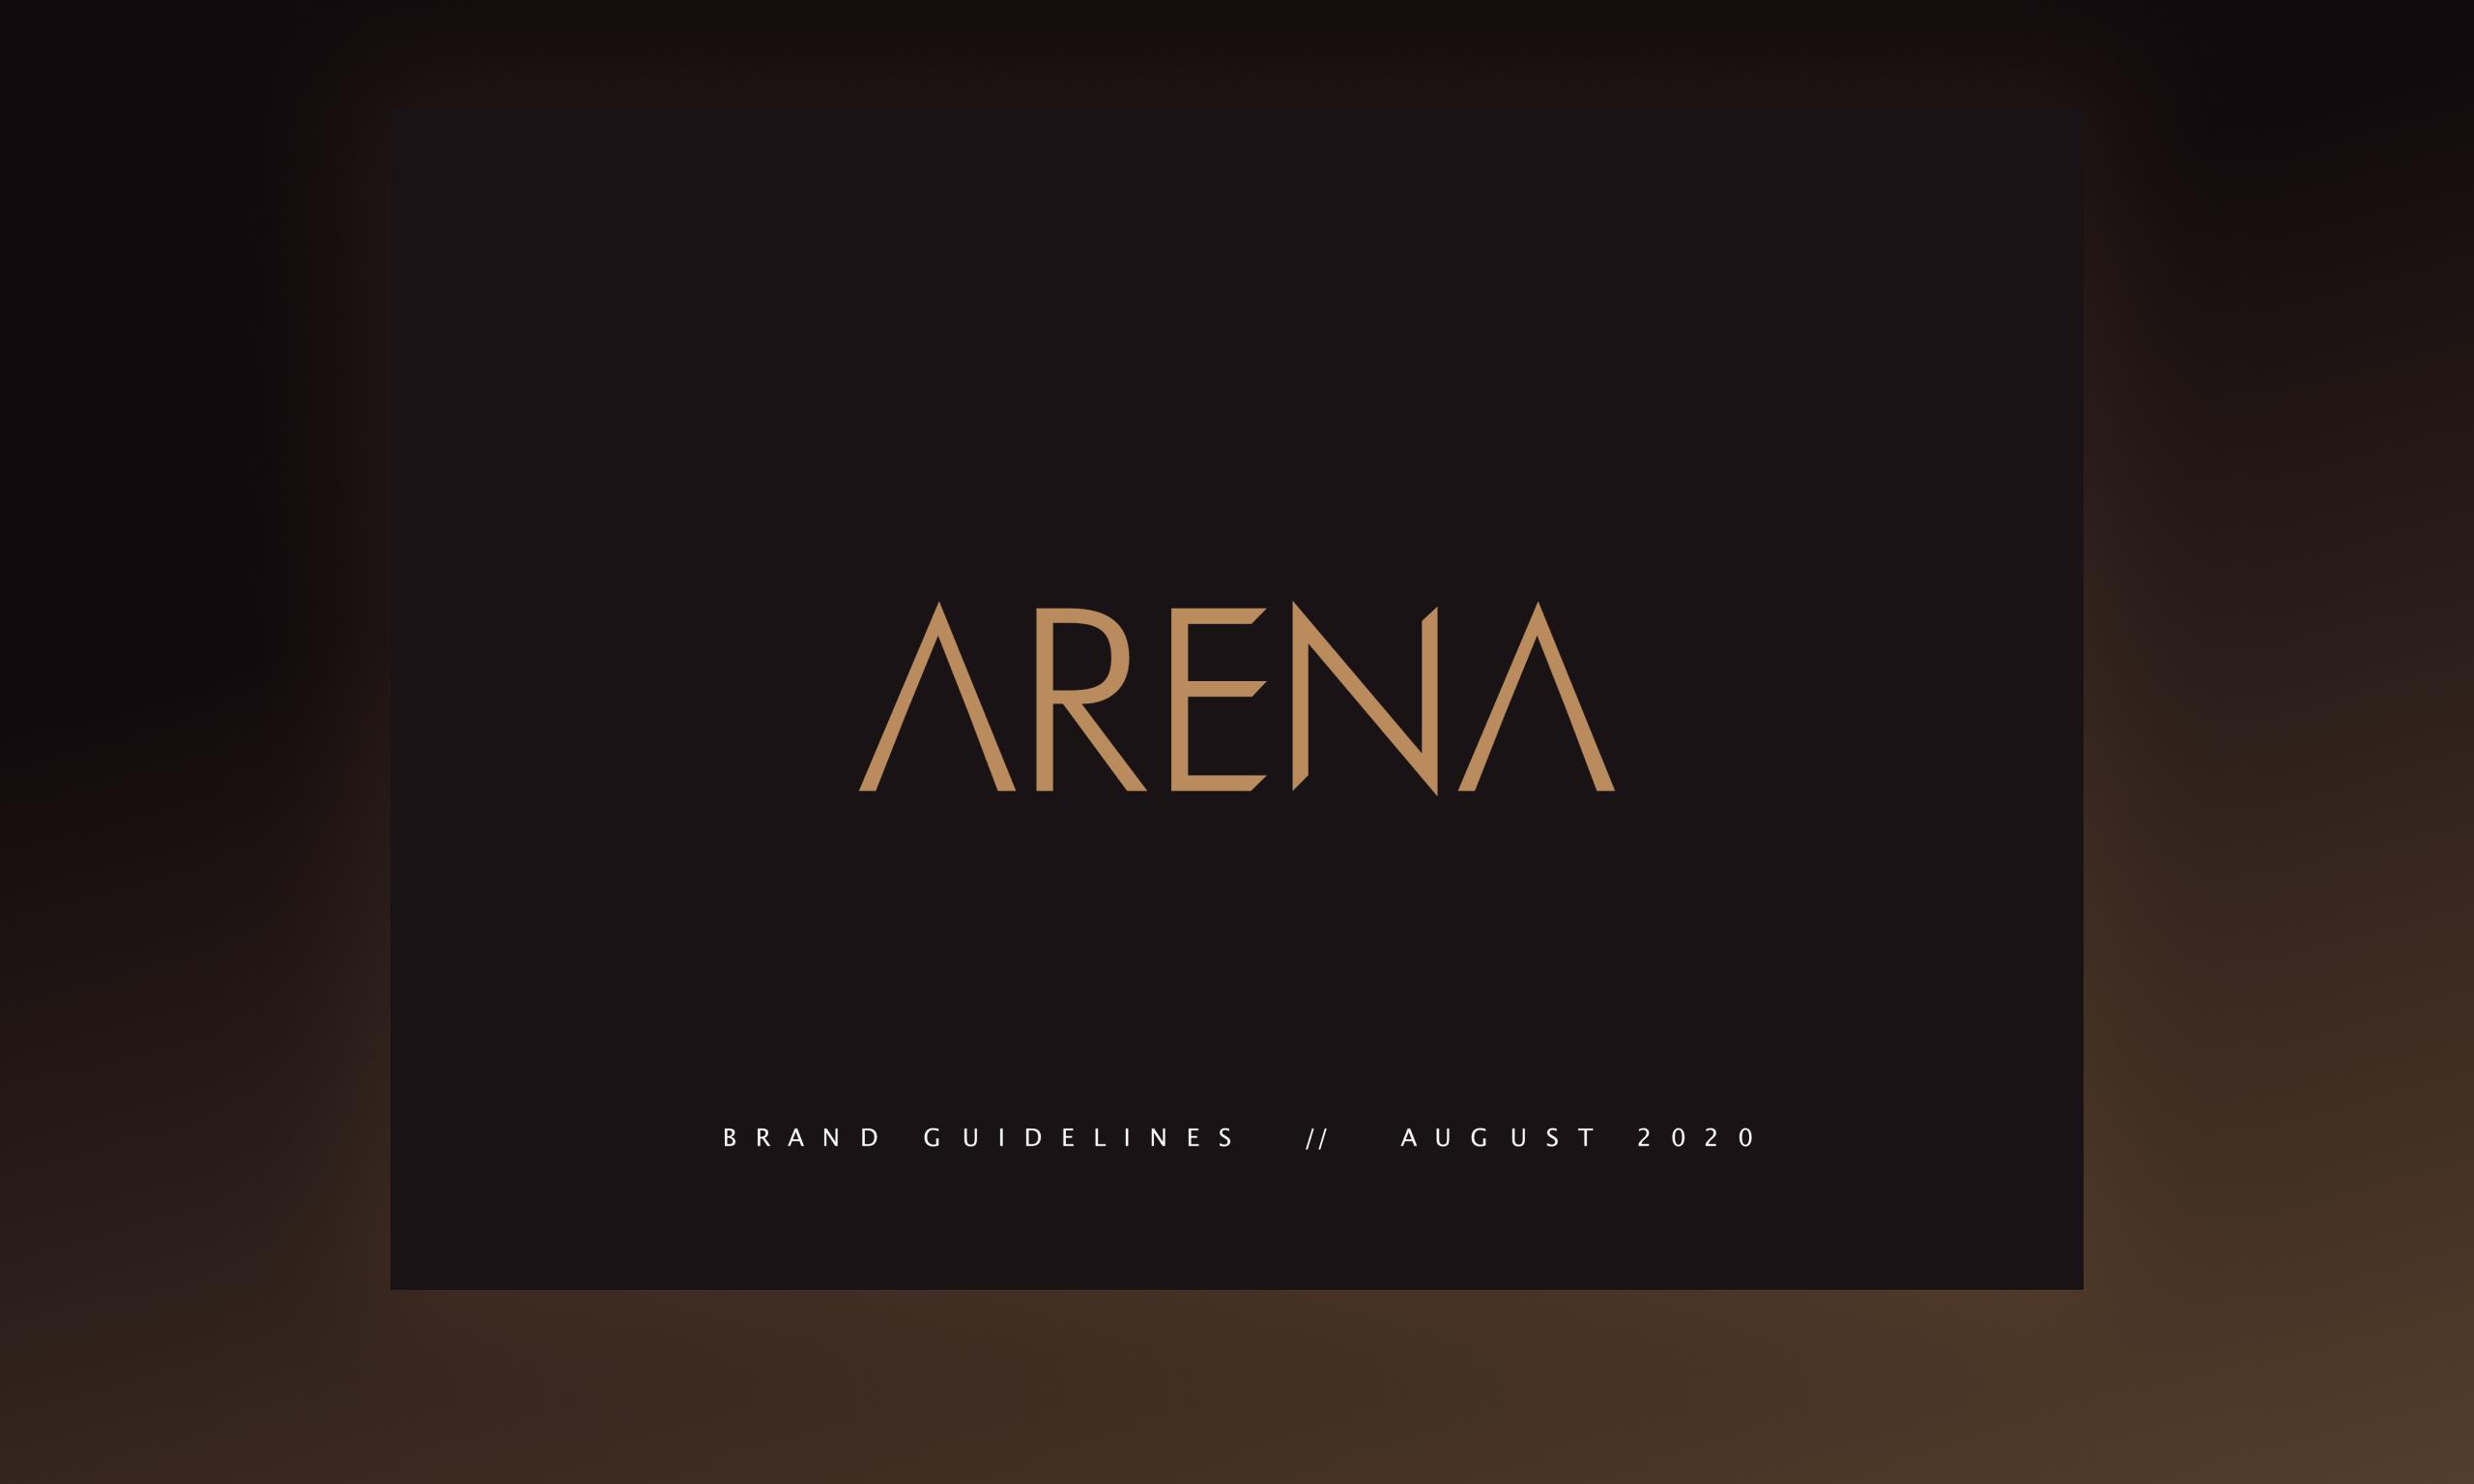 Arena Property Group - Property development company